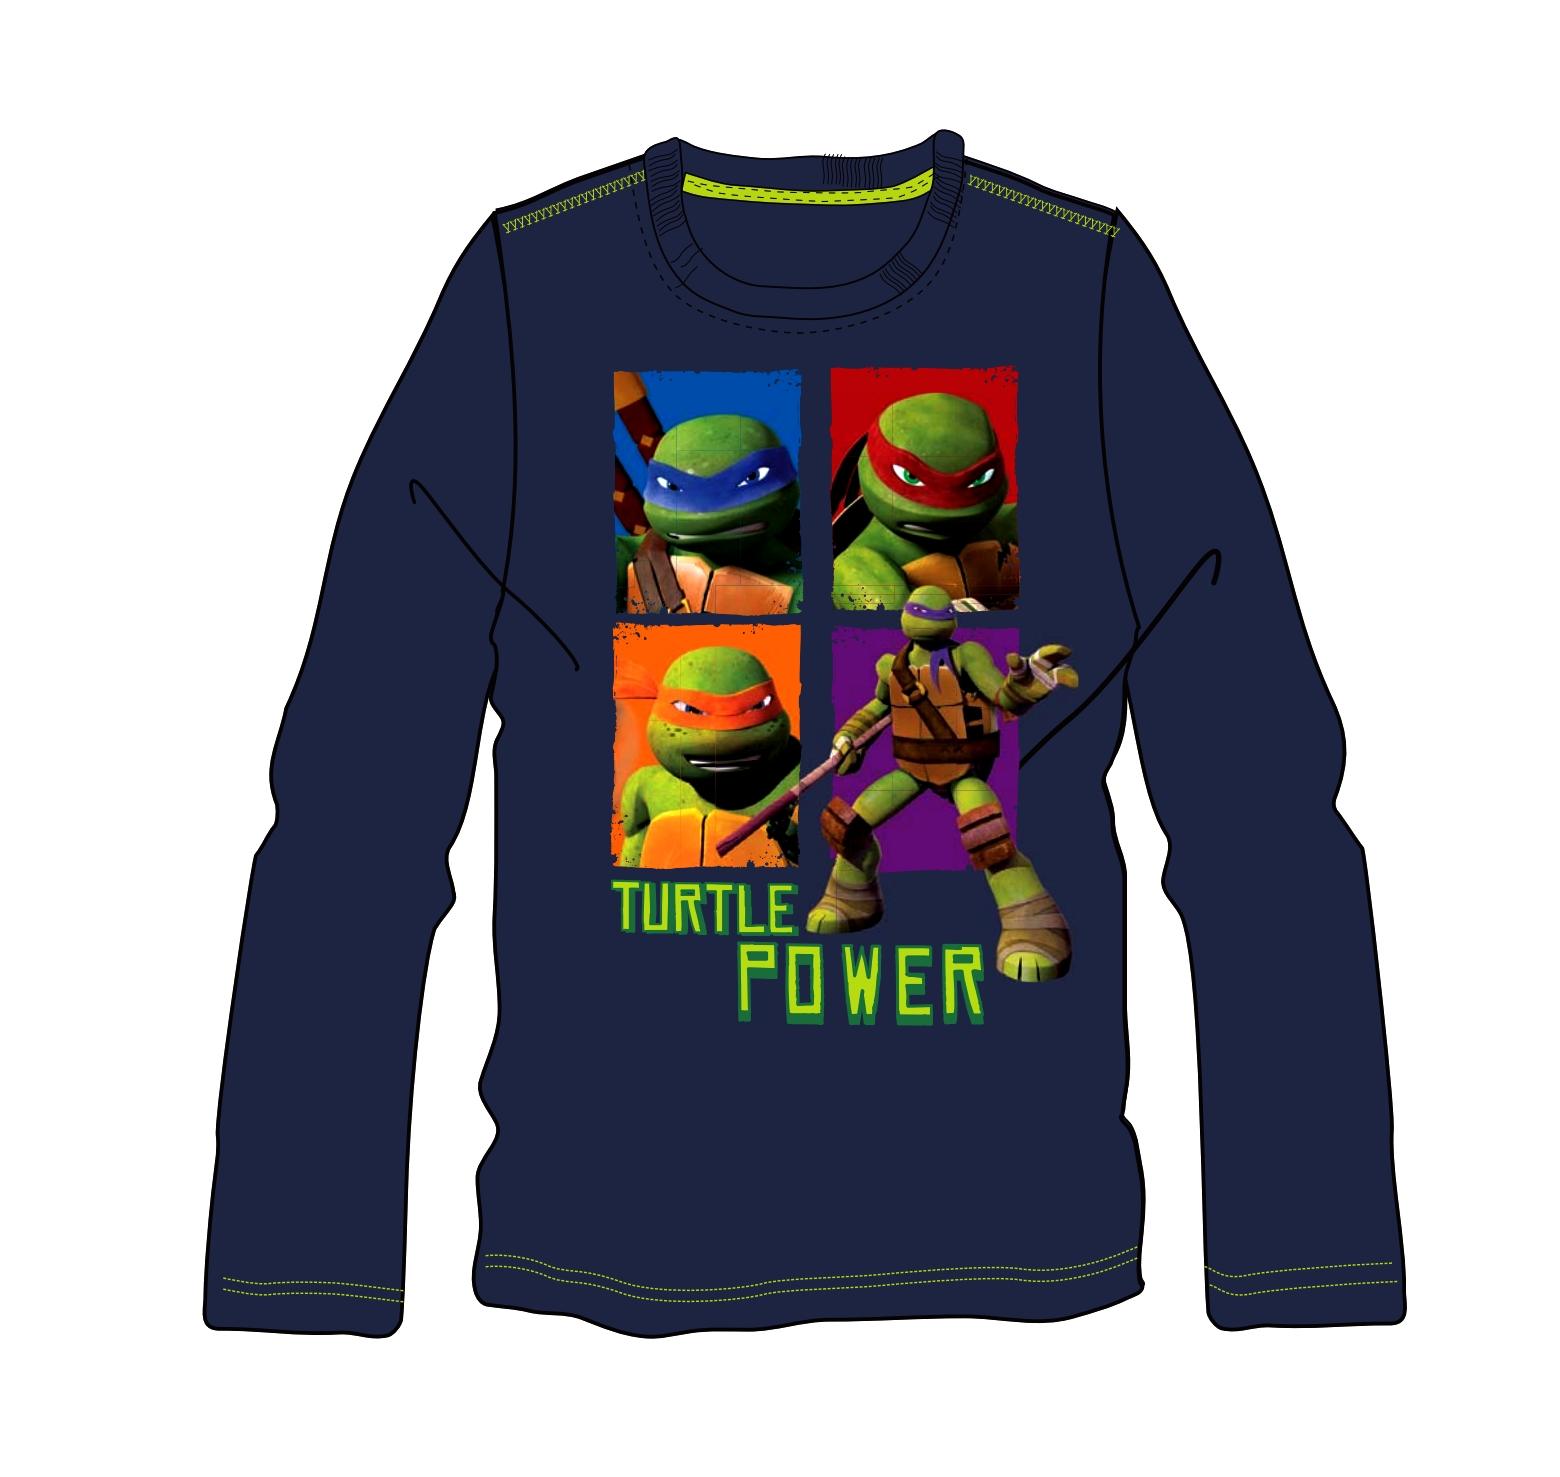 boys sleeve mutant turtles t shirt